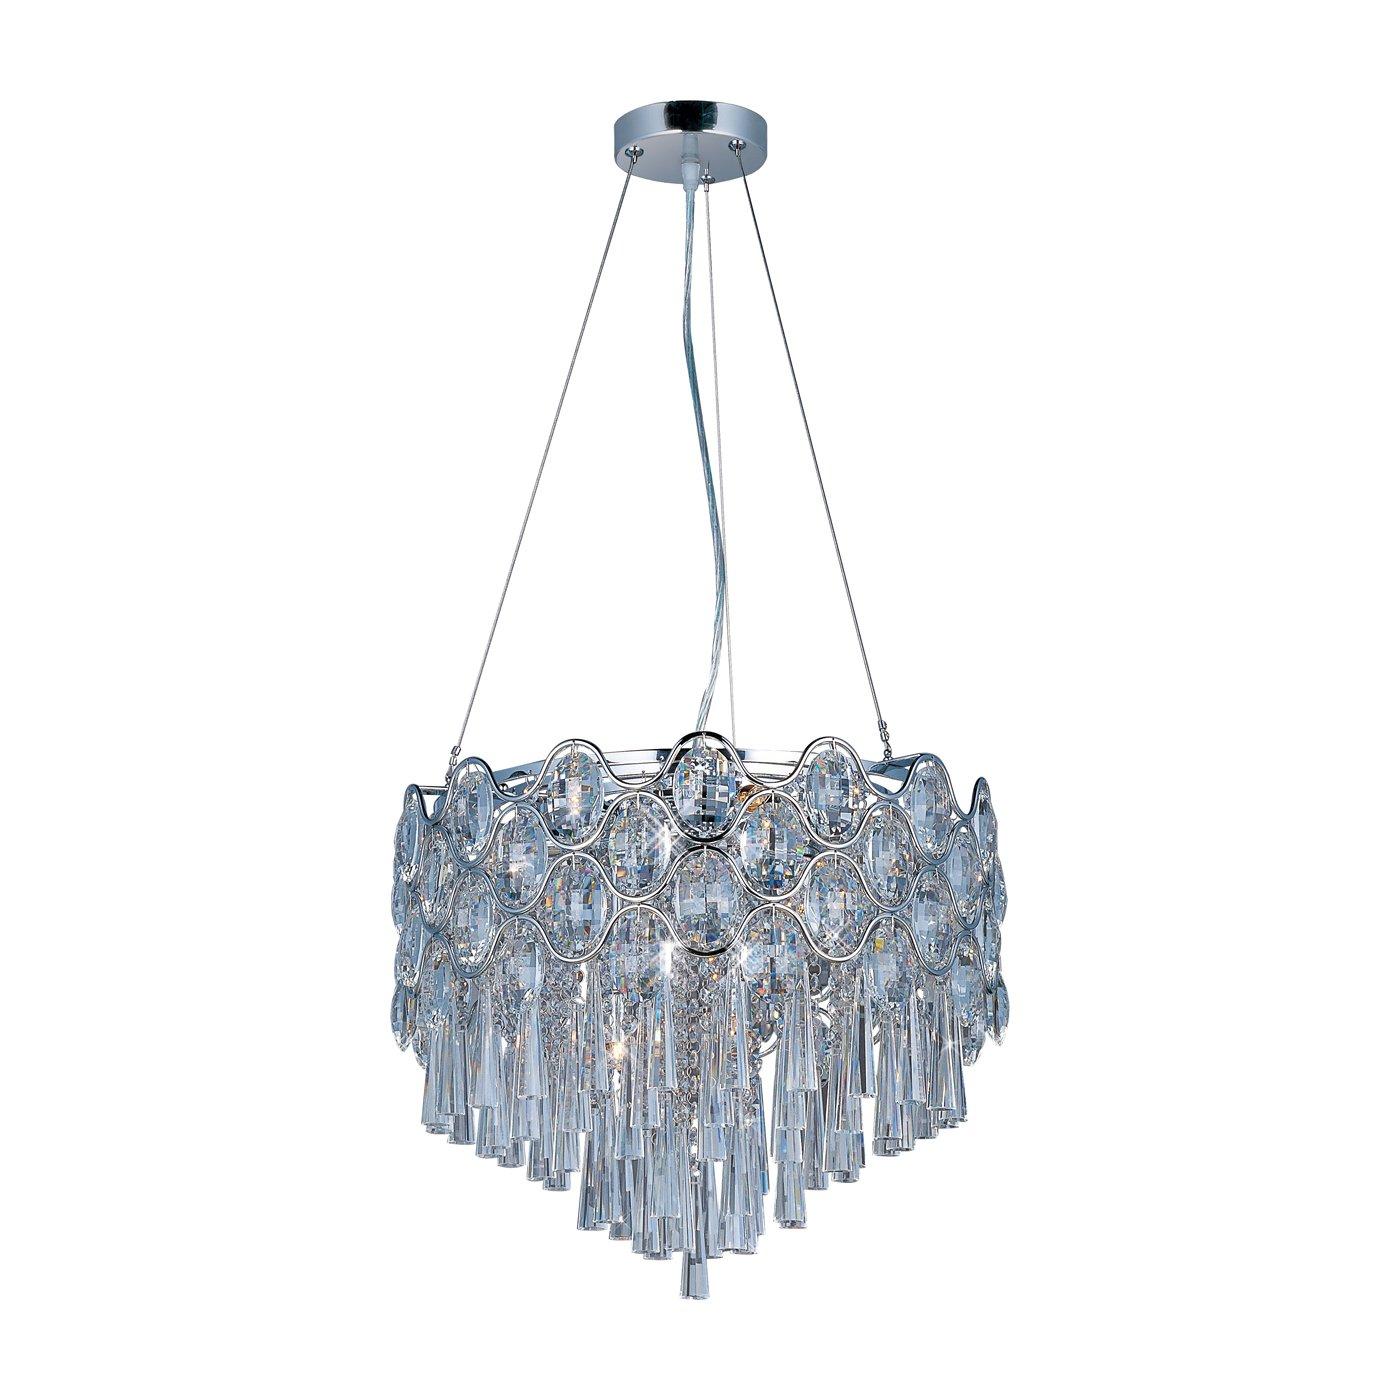 Turney Lighting Craftmade Ceiling Fan